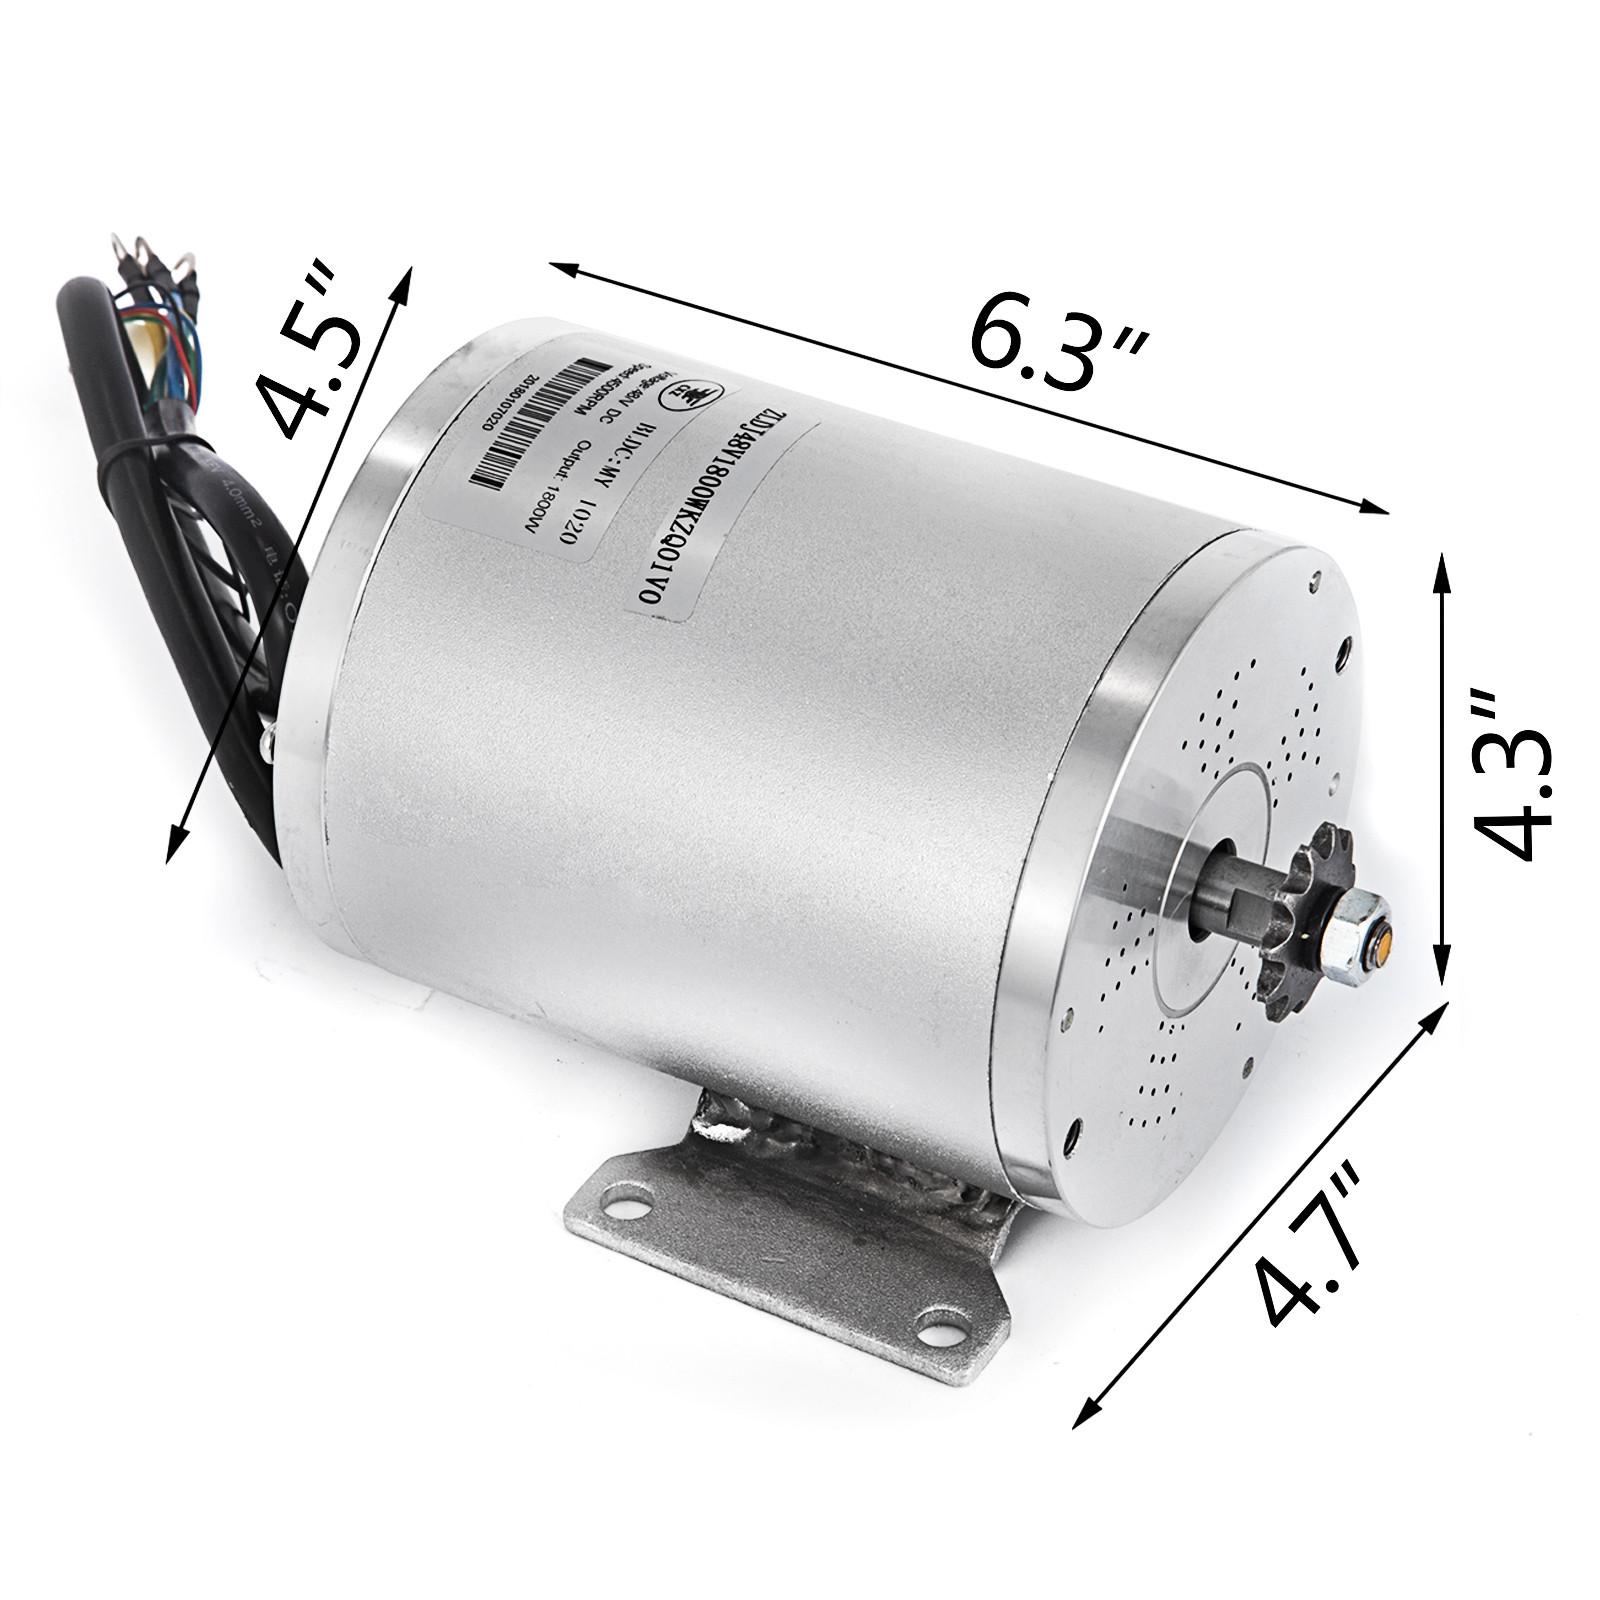 1800W-48V-DC-Brushless-Electric-Motor-Kit-f-Scooter-500-1800W-E-Bike-Go-Kart thumbnail 158